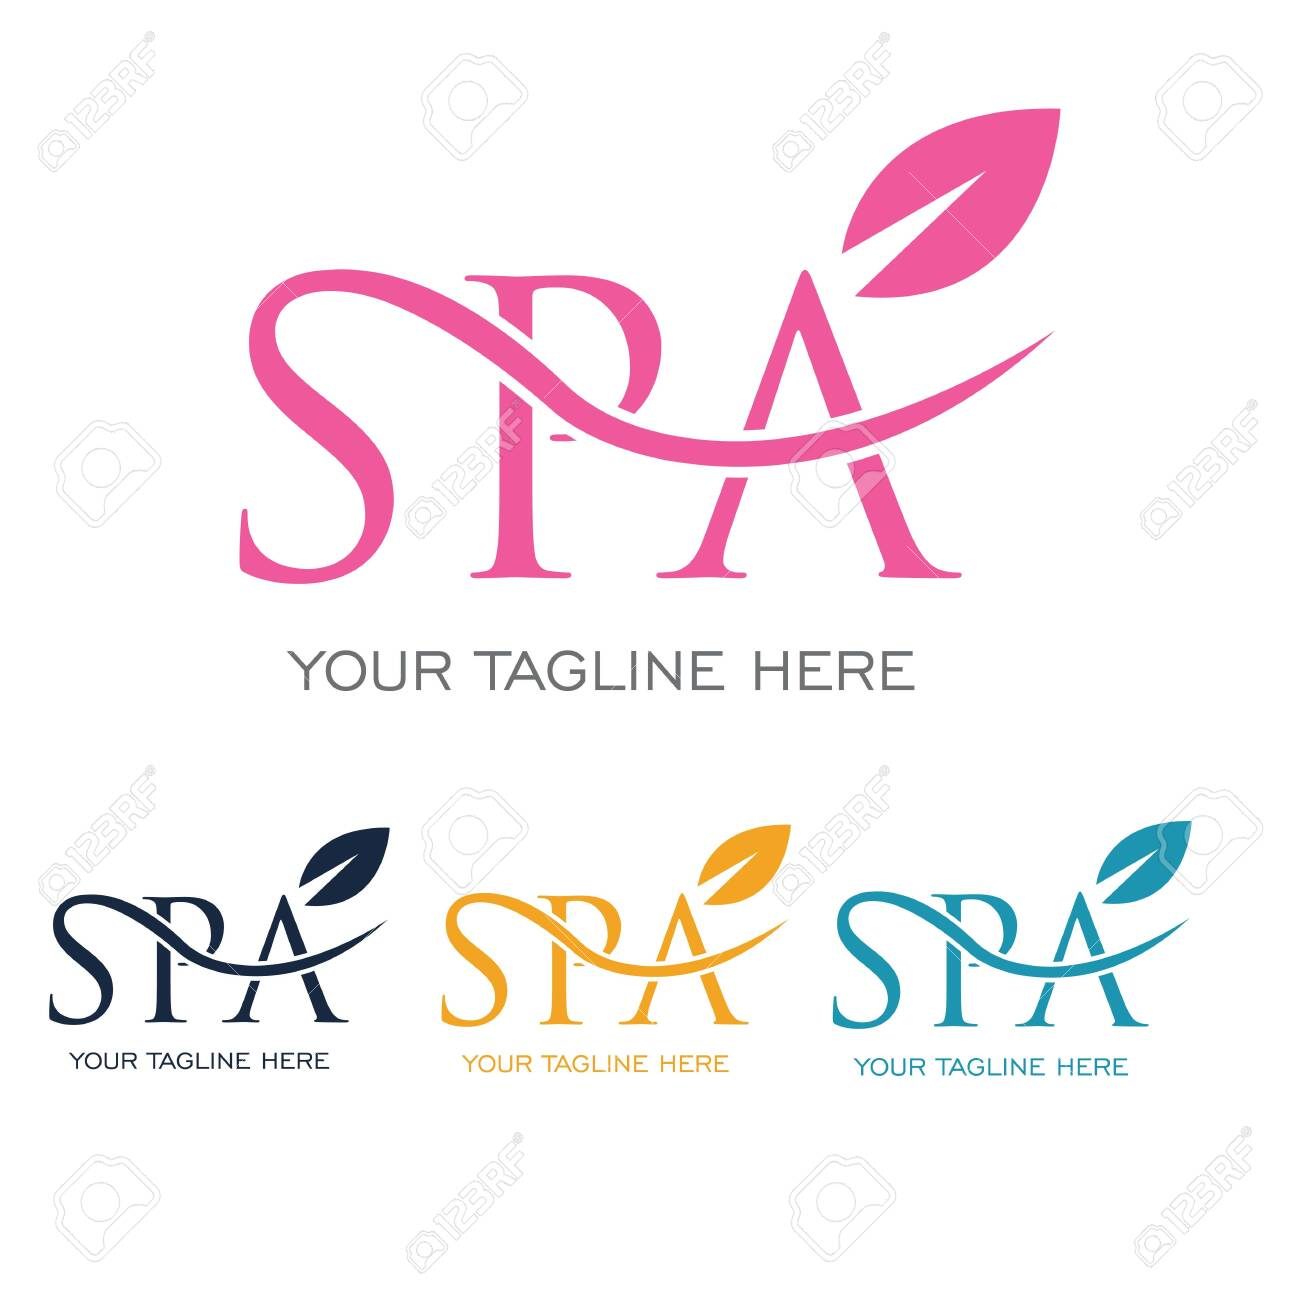 spa logo vector illustration design template - 146030519